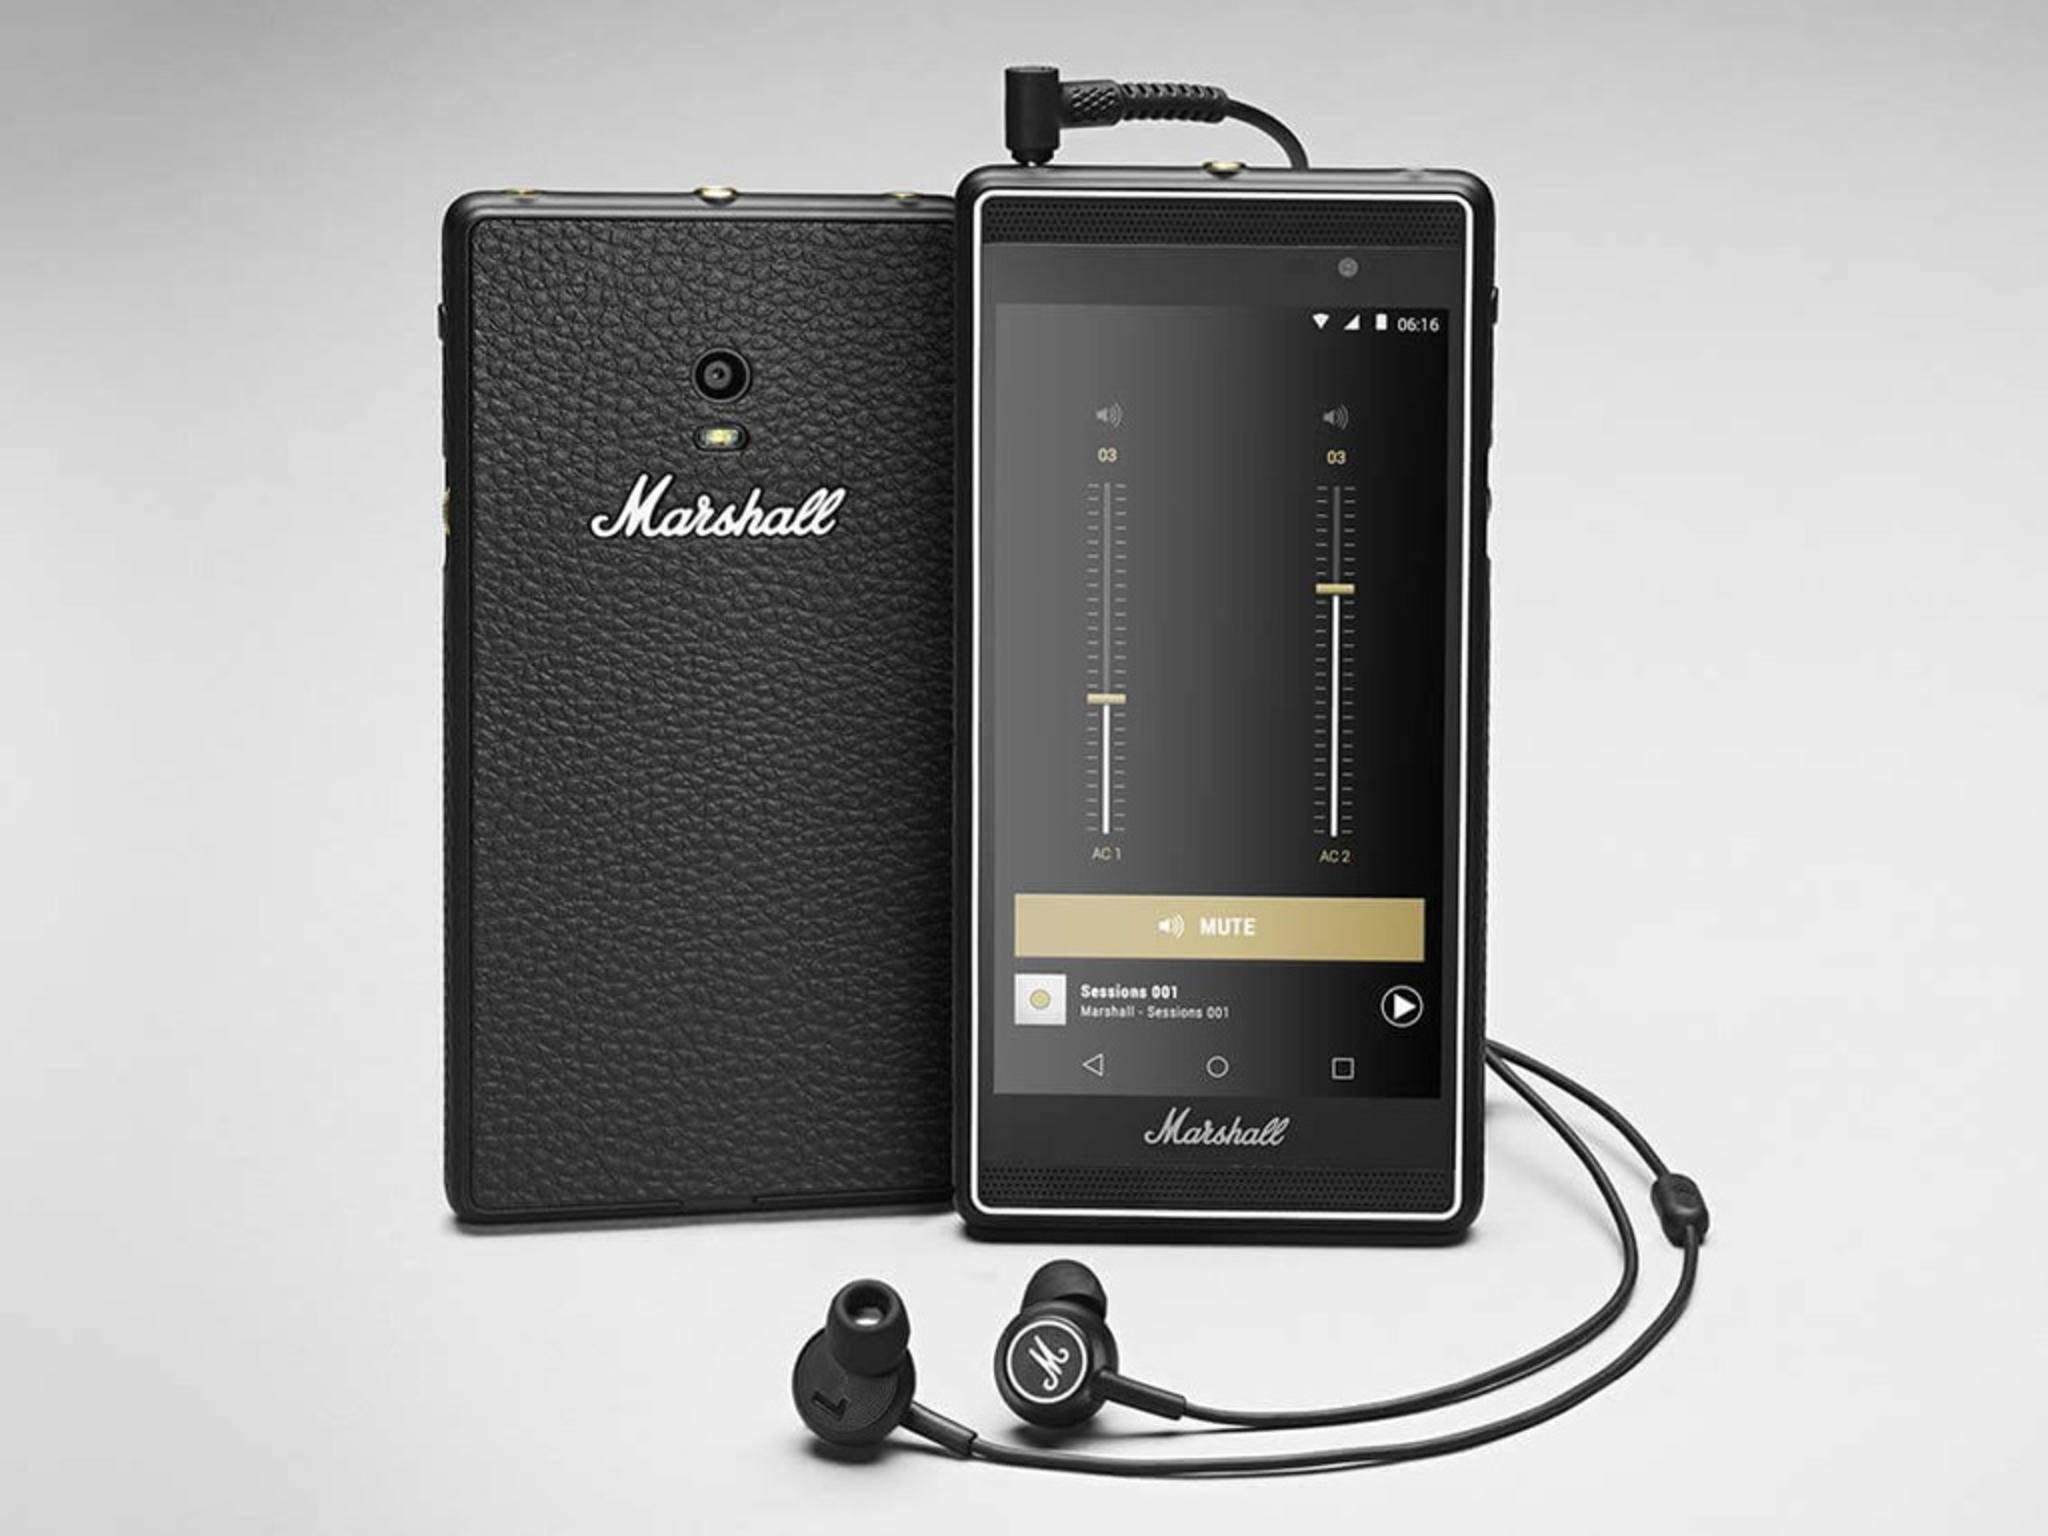 Marshall Headphones komplettiert das Package mit seinen In-Ear-Kopfhörern.